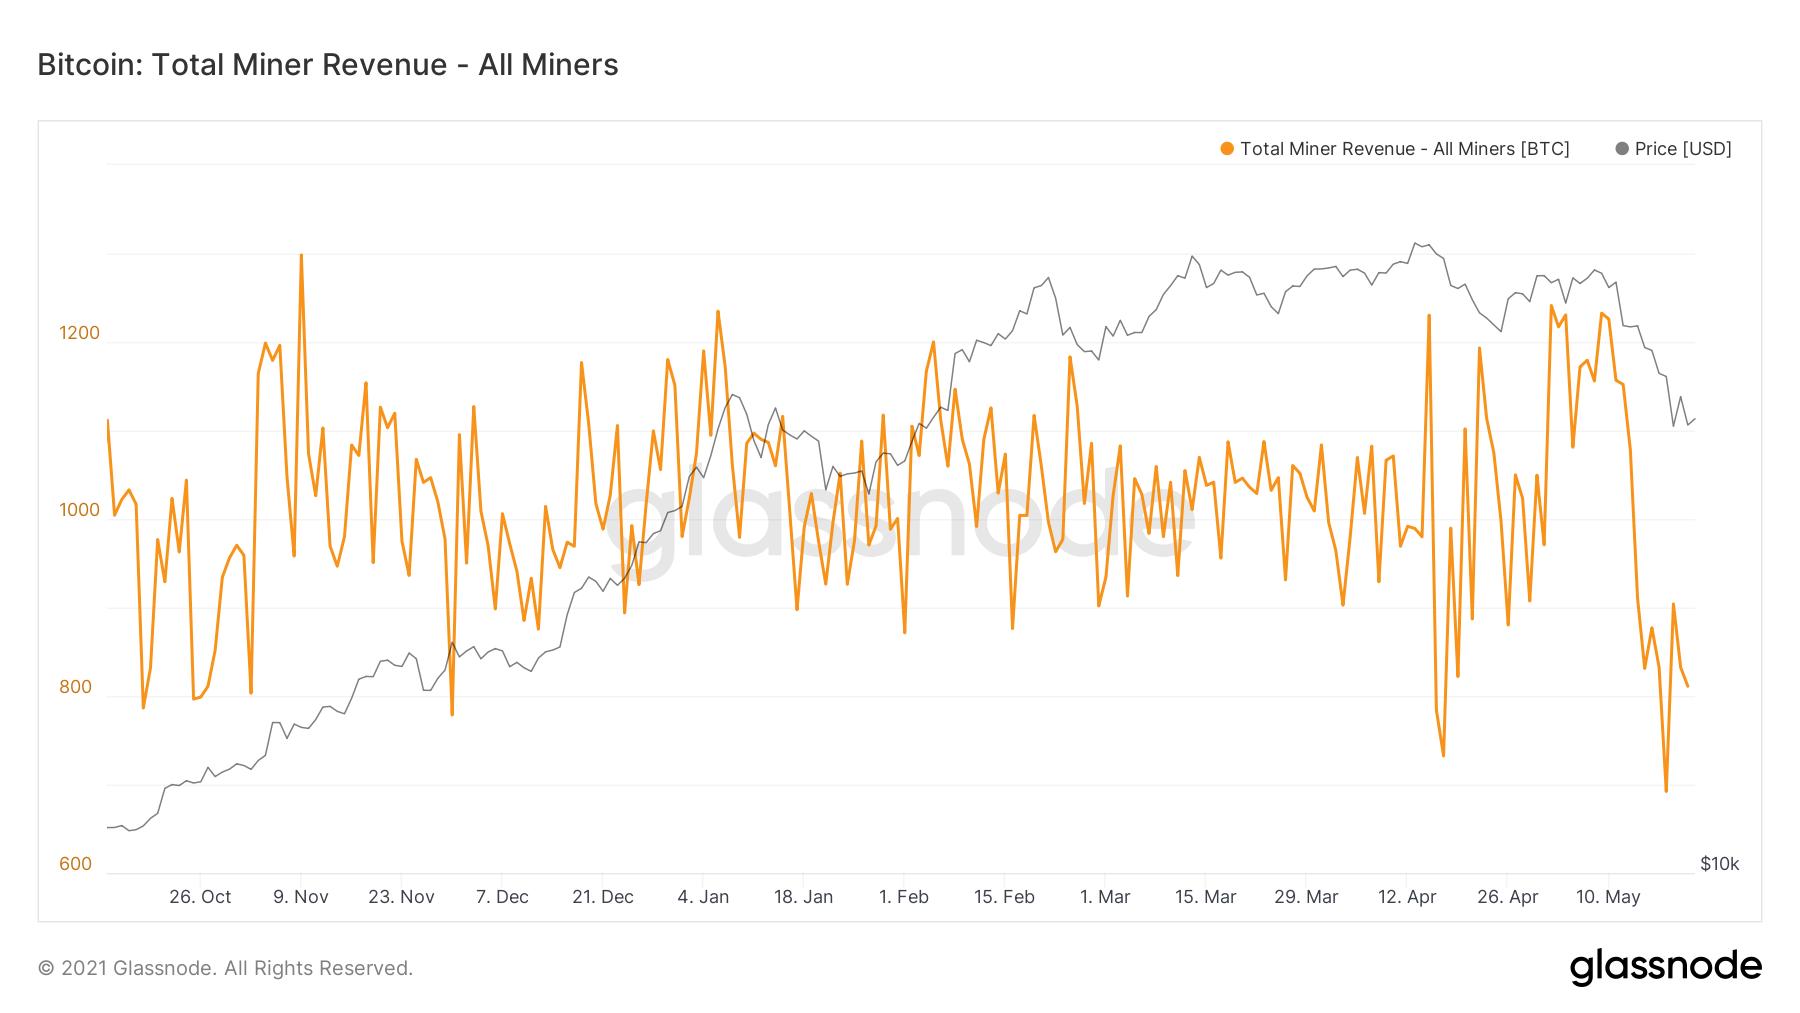 glassnode studio bitcoin total miner revenue all miners - دلیل افت دیروز ارزش بیتکوین ، قطعی مجدد برق در چین بود؟